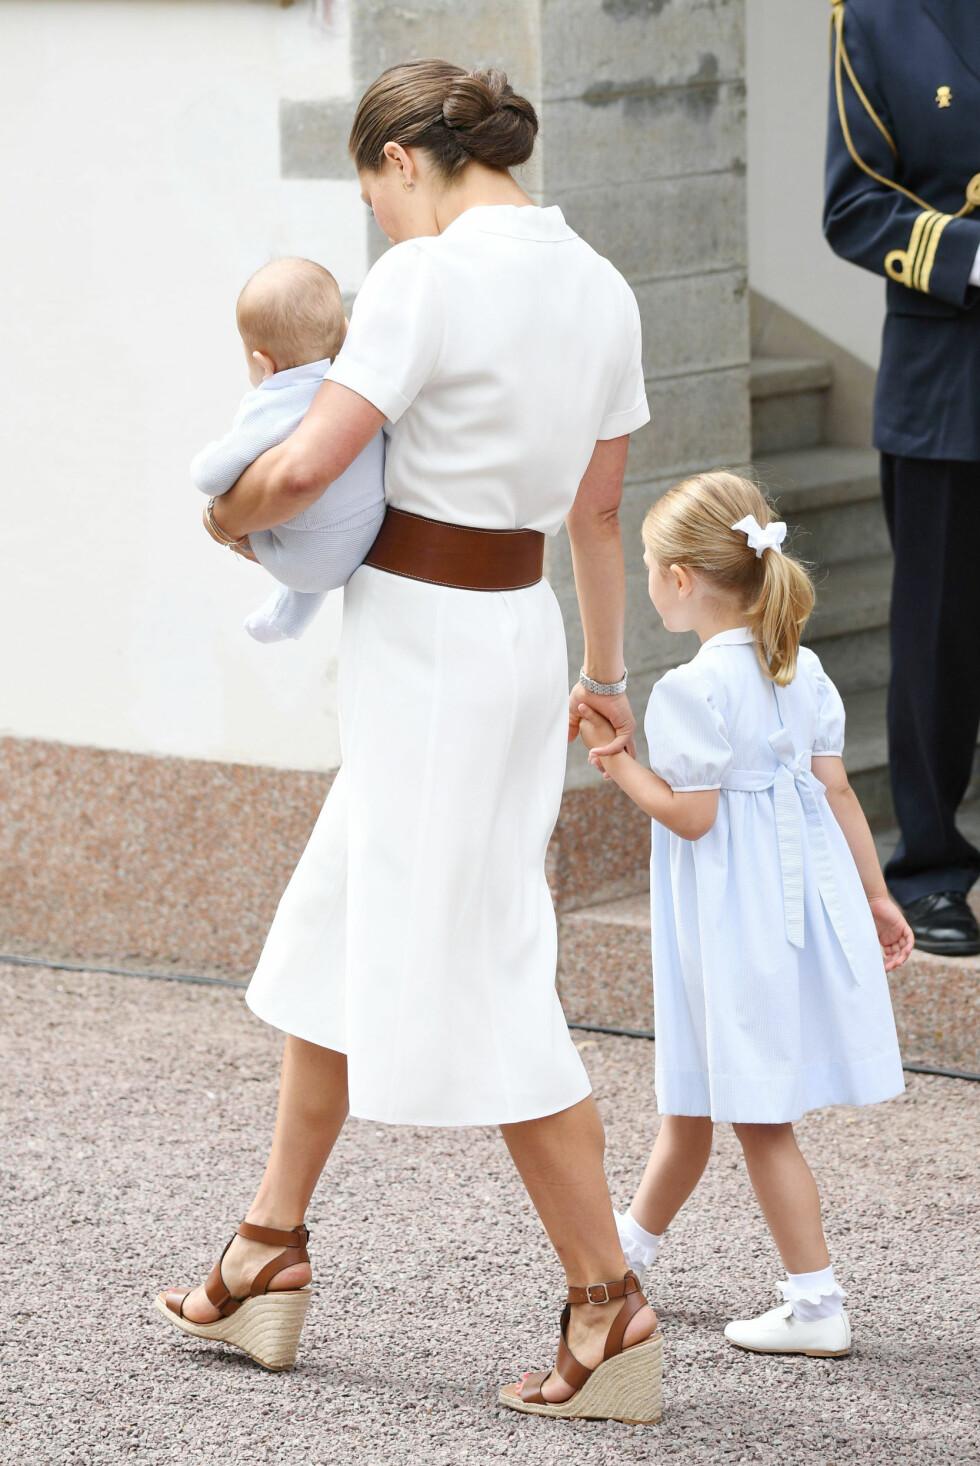 MORSKJÆRLIGHET: Kronprinsesse Victoria med sønnen prins Oscar og datteren prinsesse Estelle på Solliden slott i forbindelse med 39-årsdagen hennes i juli 2016. FOTO: NTB Scanpix